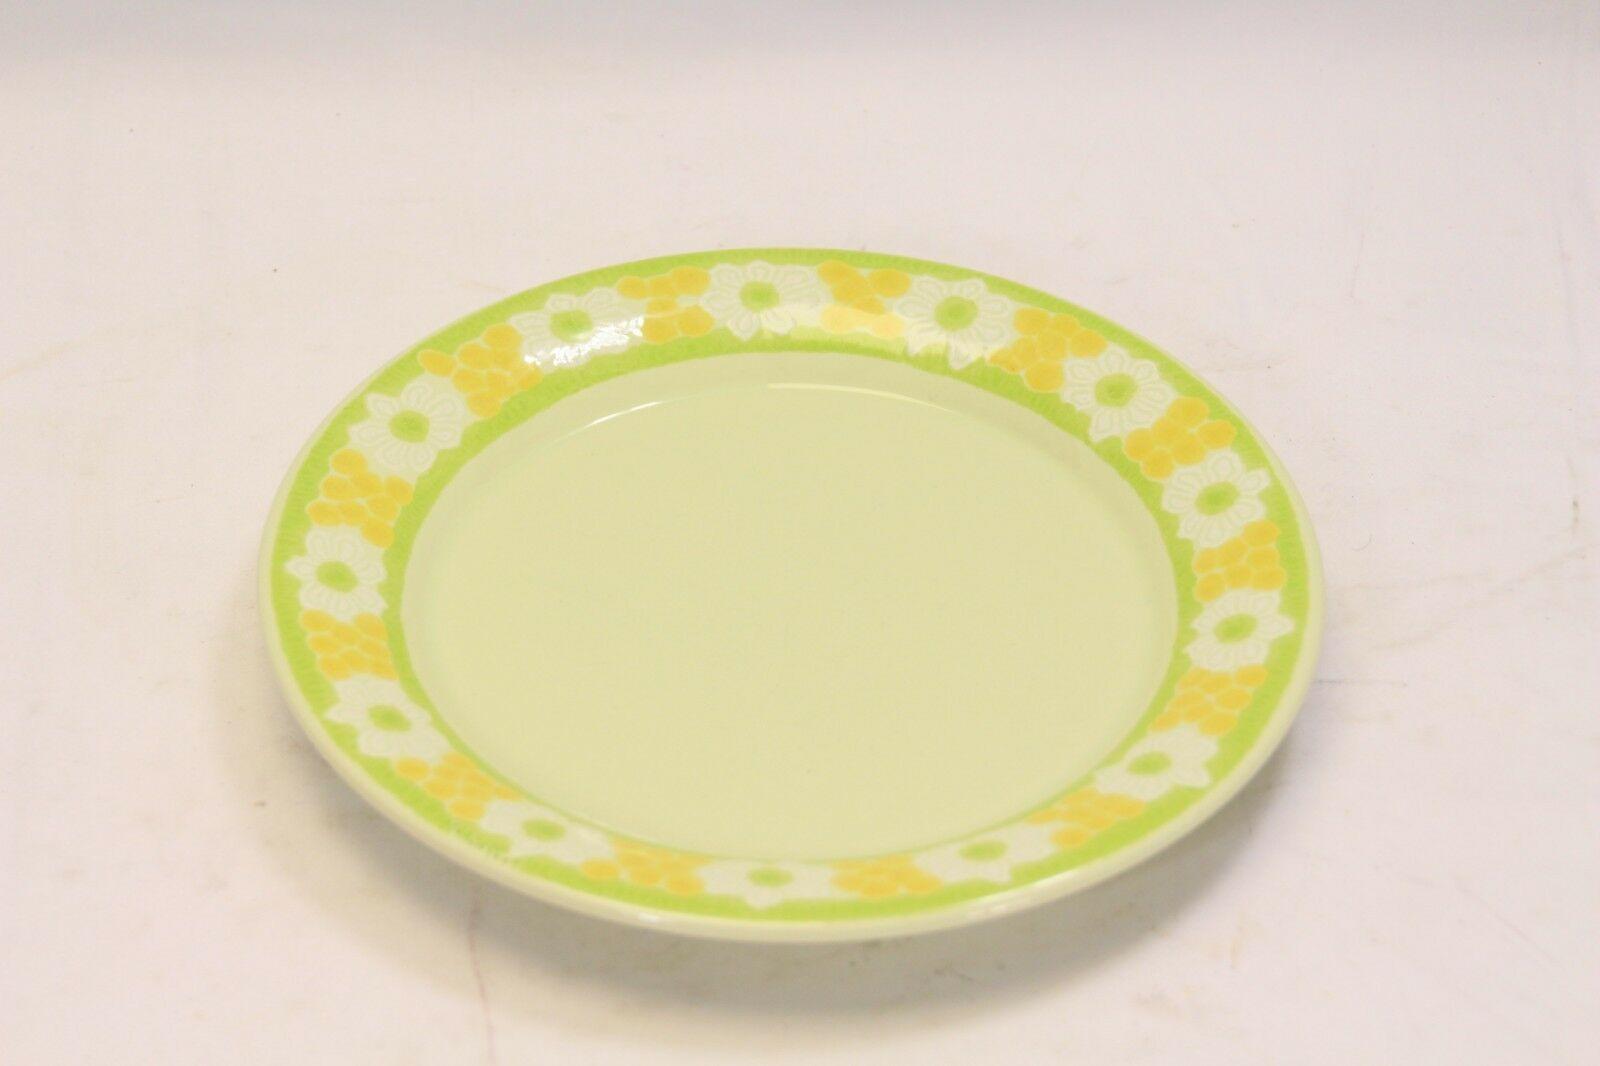 Franciscan Picnic Bowls Cups Saucers Salad Plates 10 pc